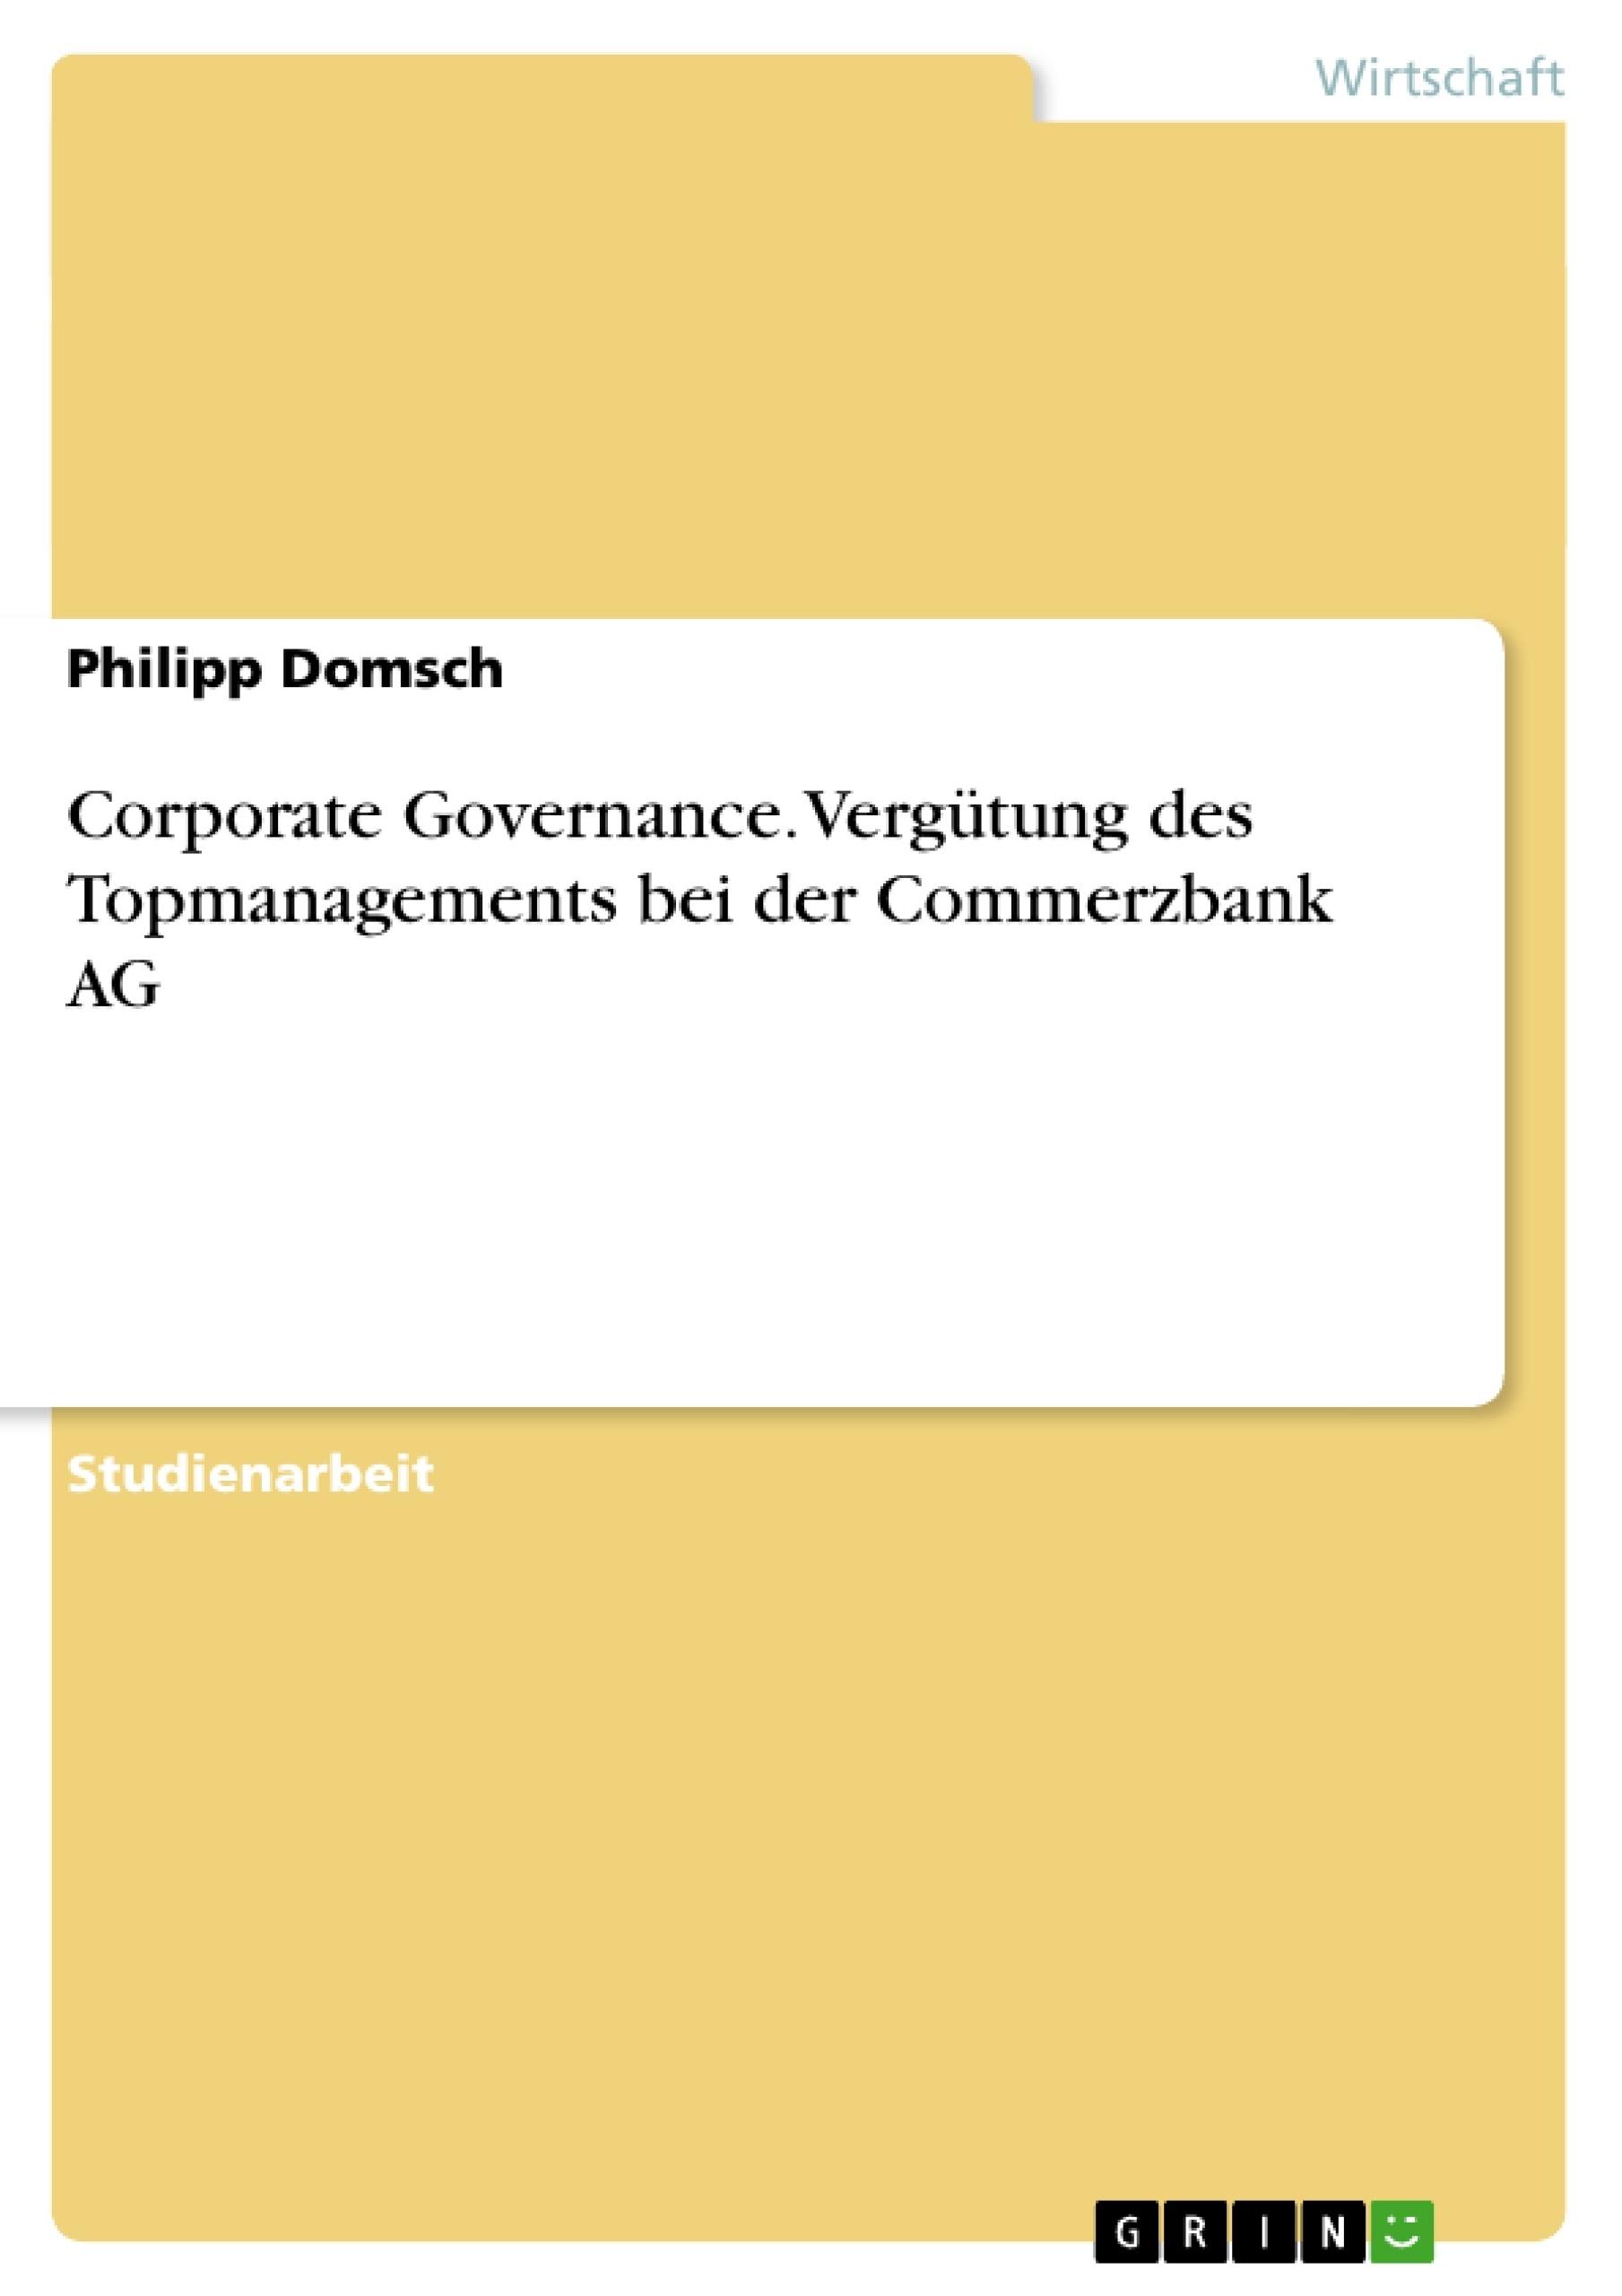 Titel: Corporate Governance. Vergütung des Topmanagements bei der Commerzbank AG